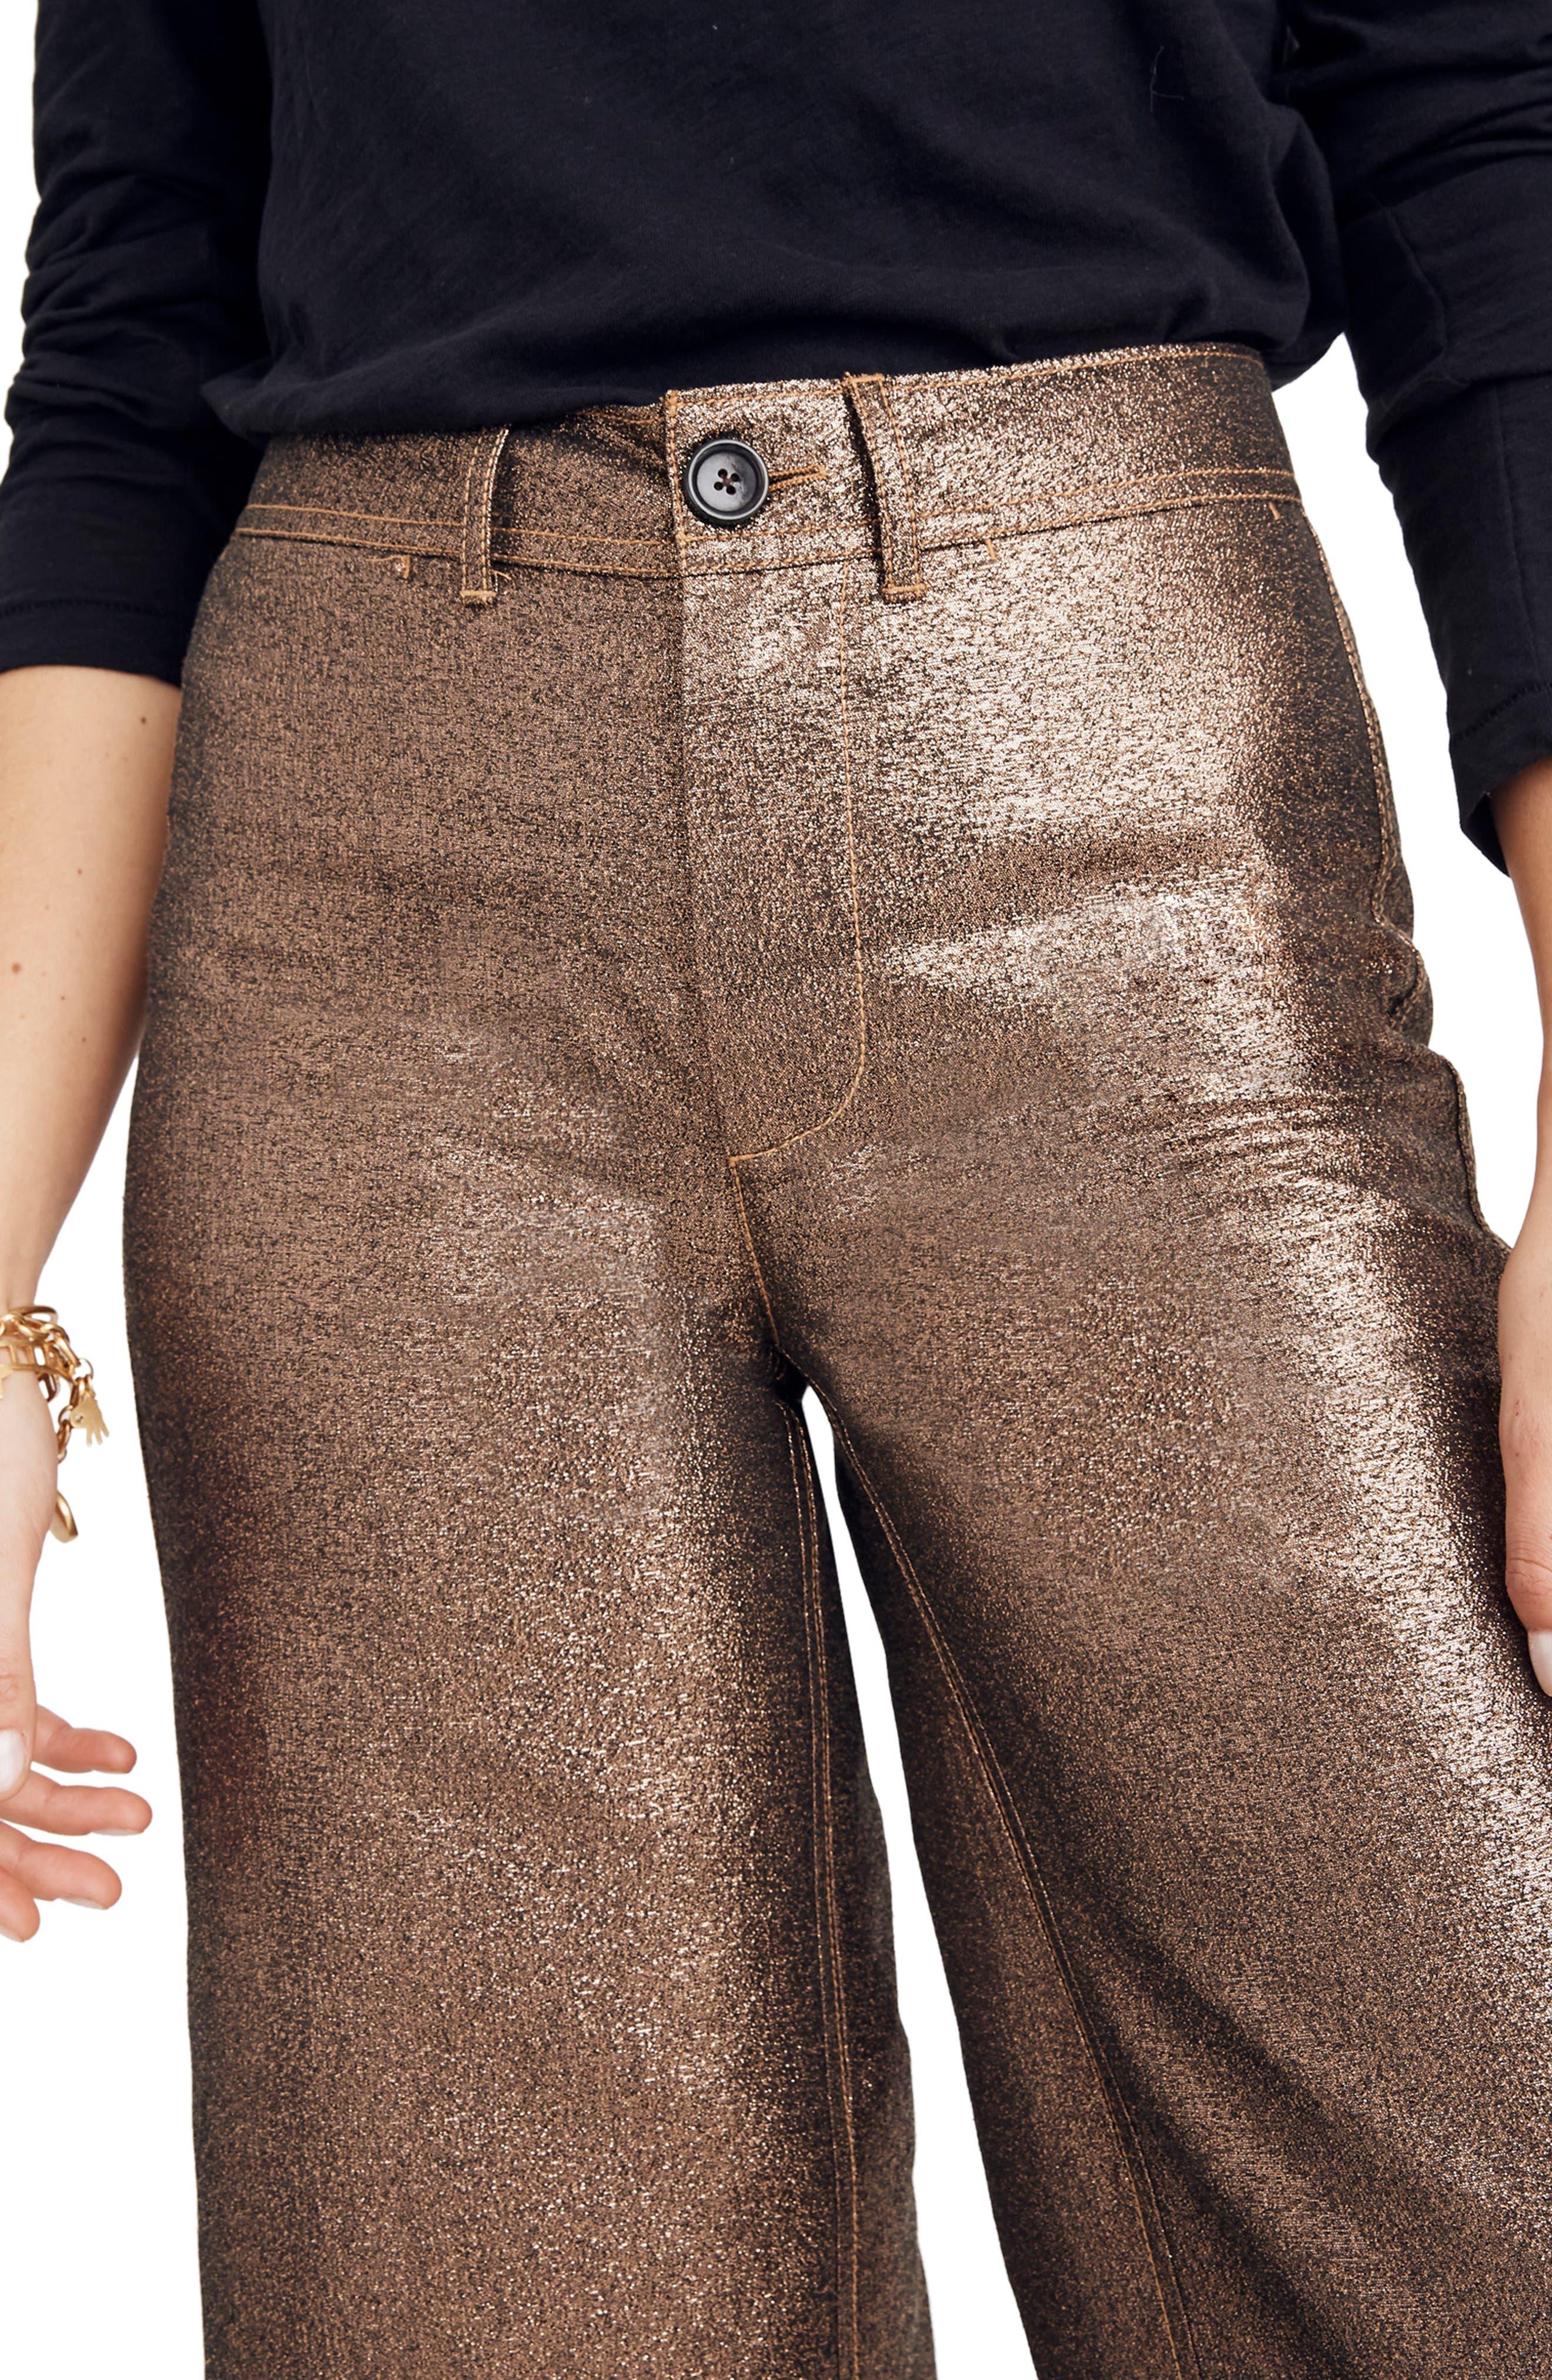 Langford Metallic Crop Wide Leg Pants,                             Alternate thumbnail 4, color,                             METALLIC SAND